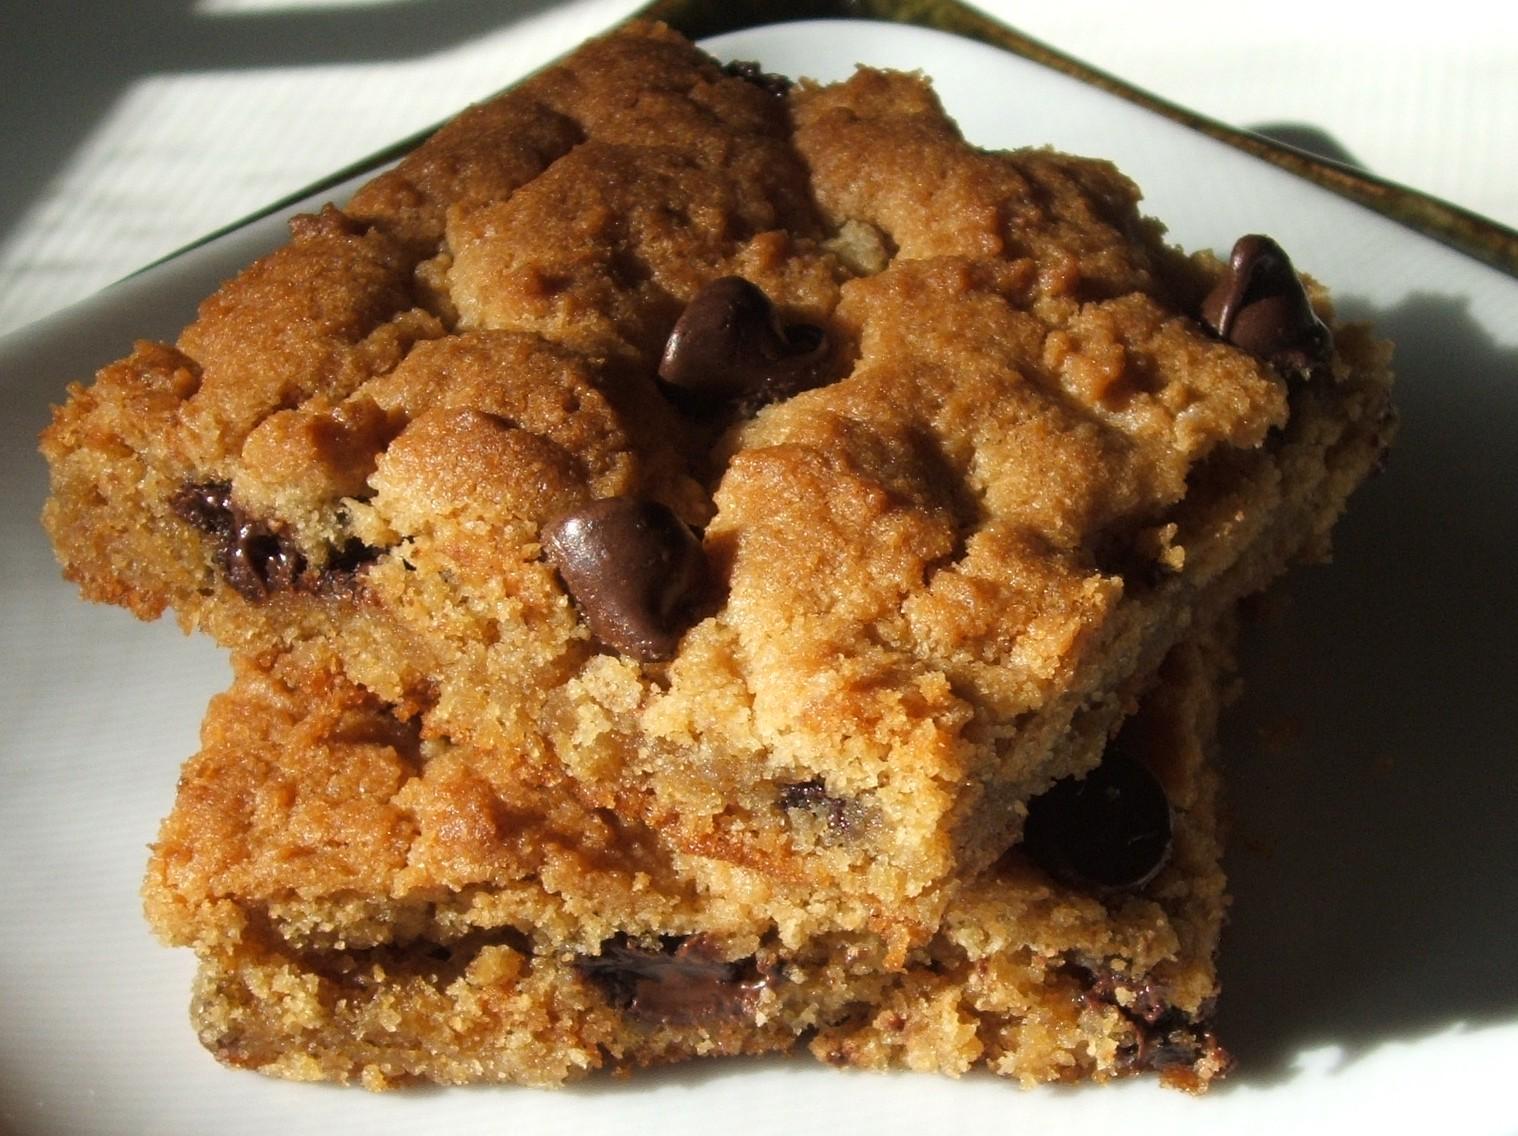 Calories In Peanut Butter Chocolate Chip Larabar